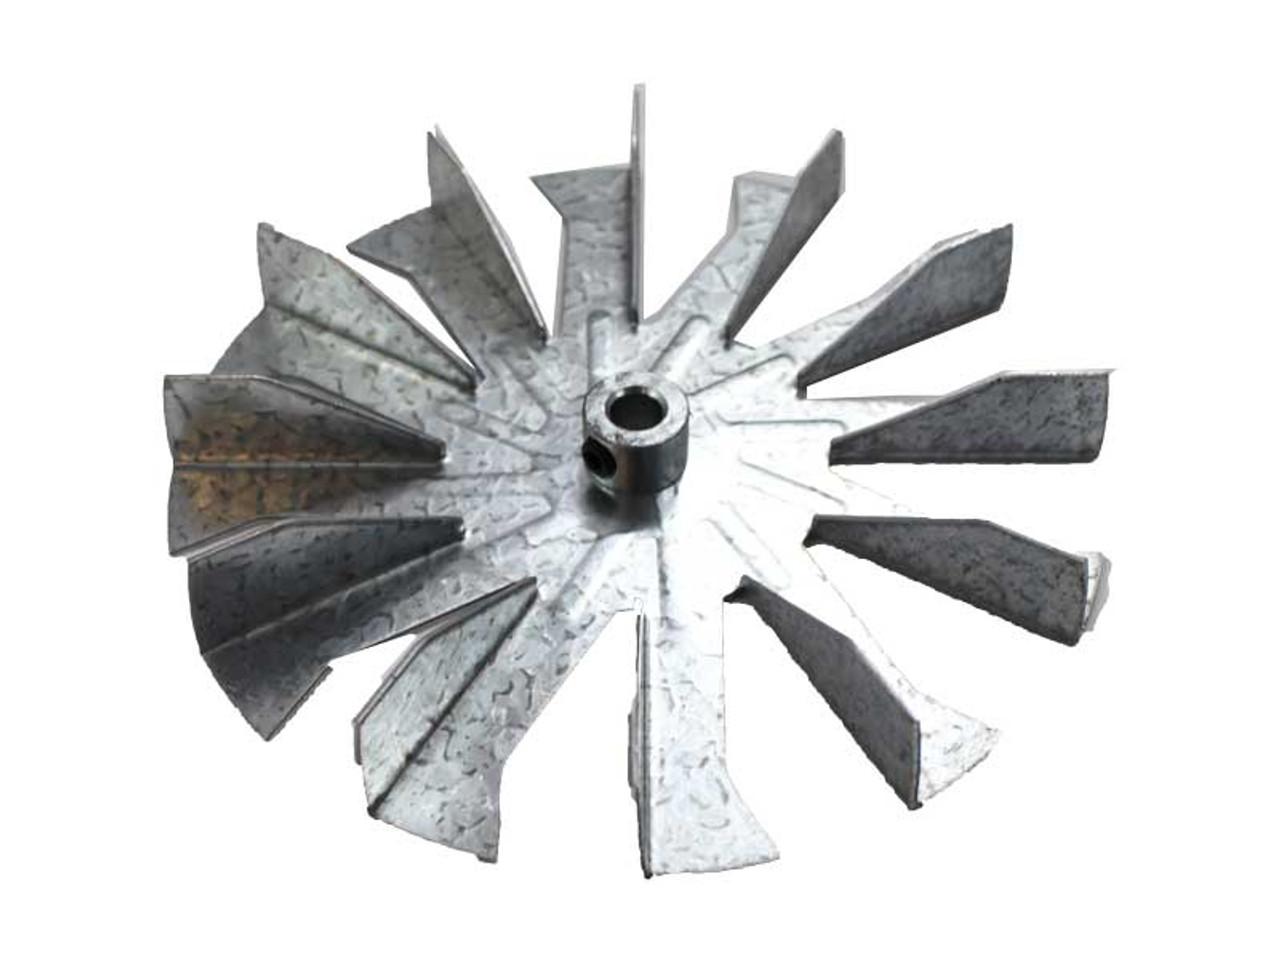 Enviro Maxx & Omega & Vista Flame Combustion Blower Fan Blade (17-1014)